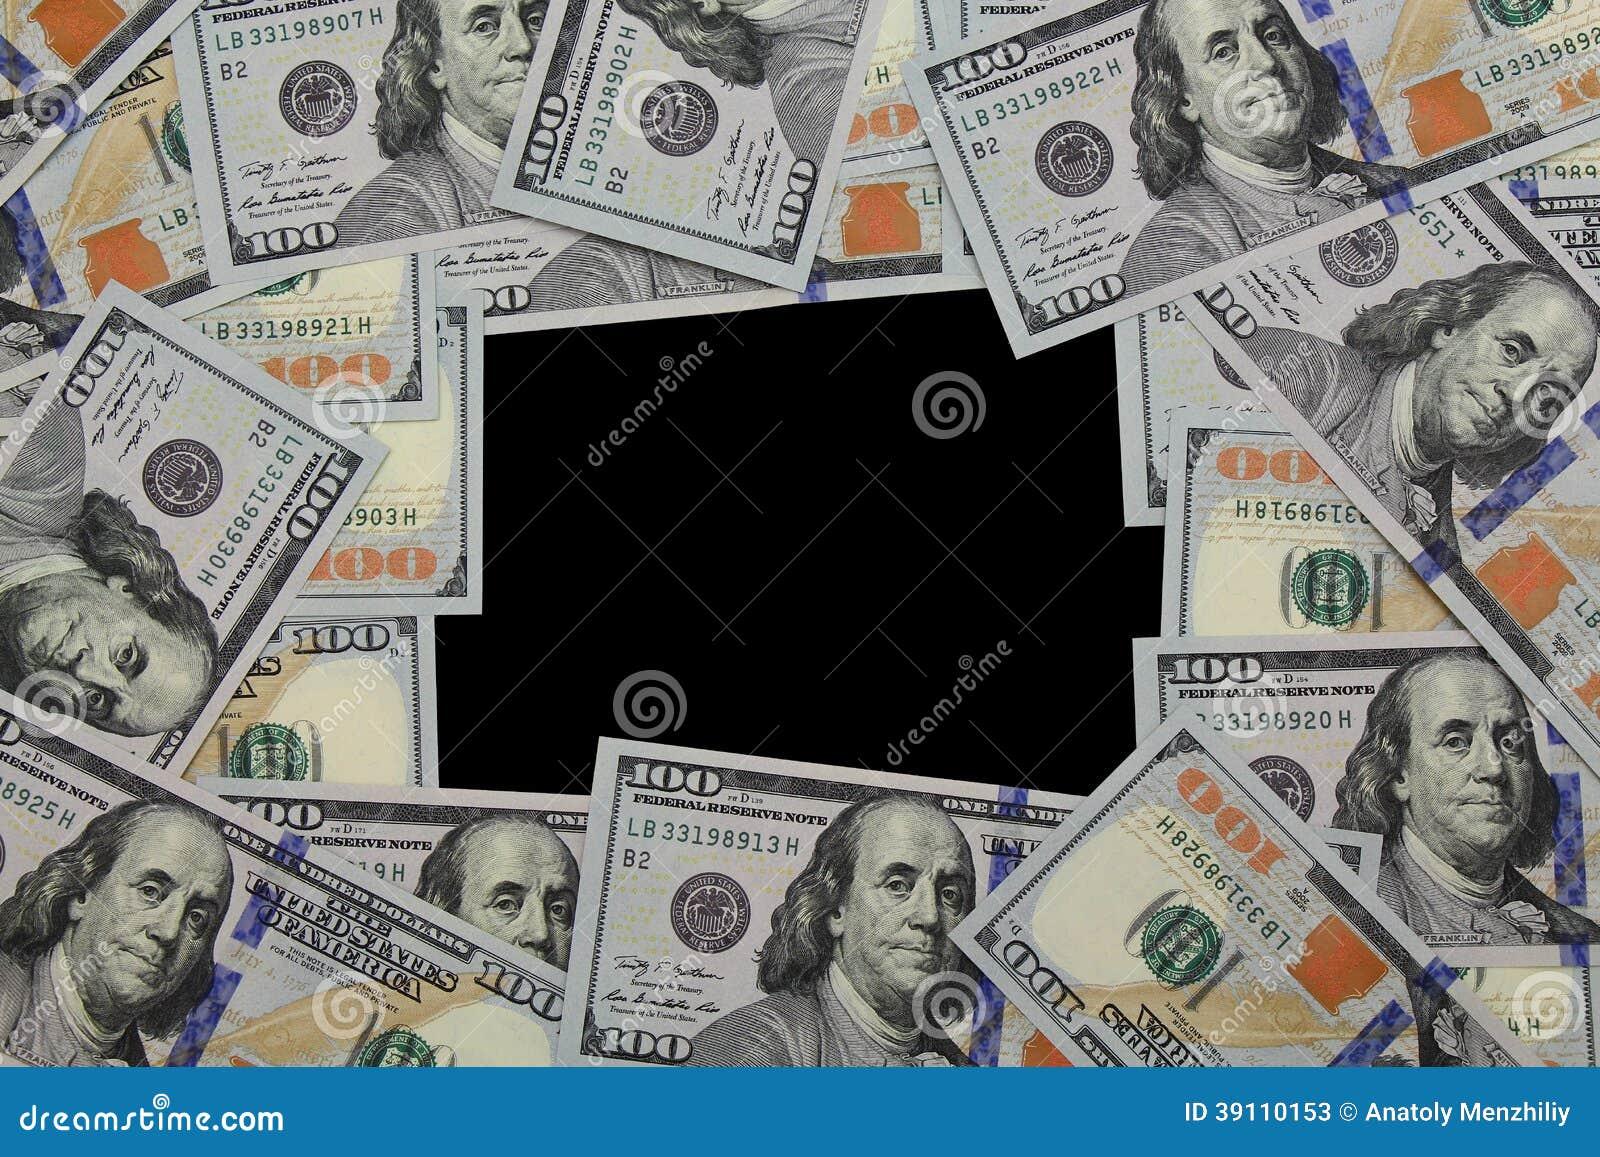 USD frame